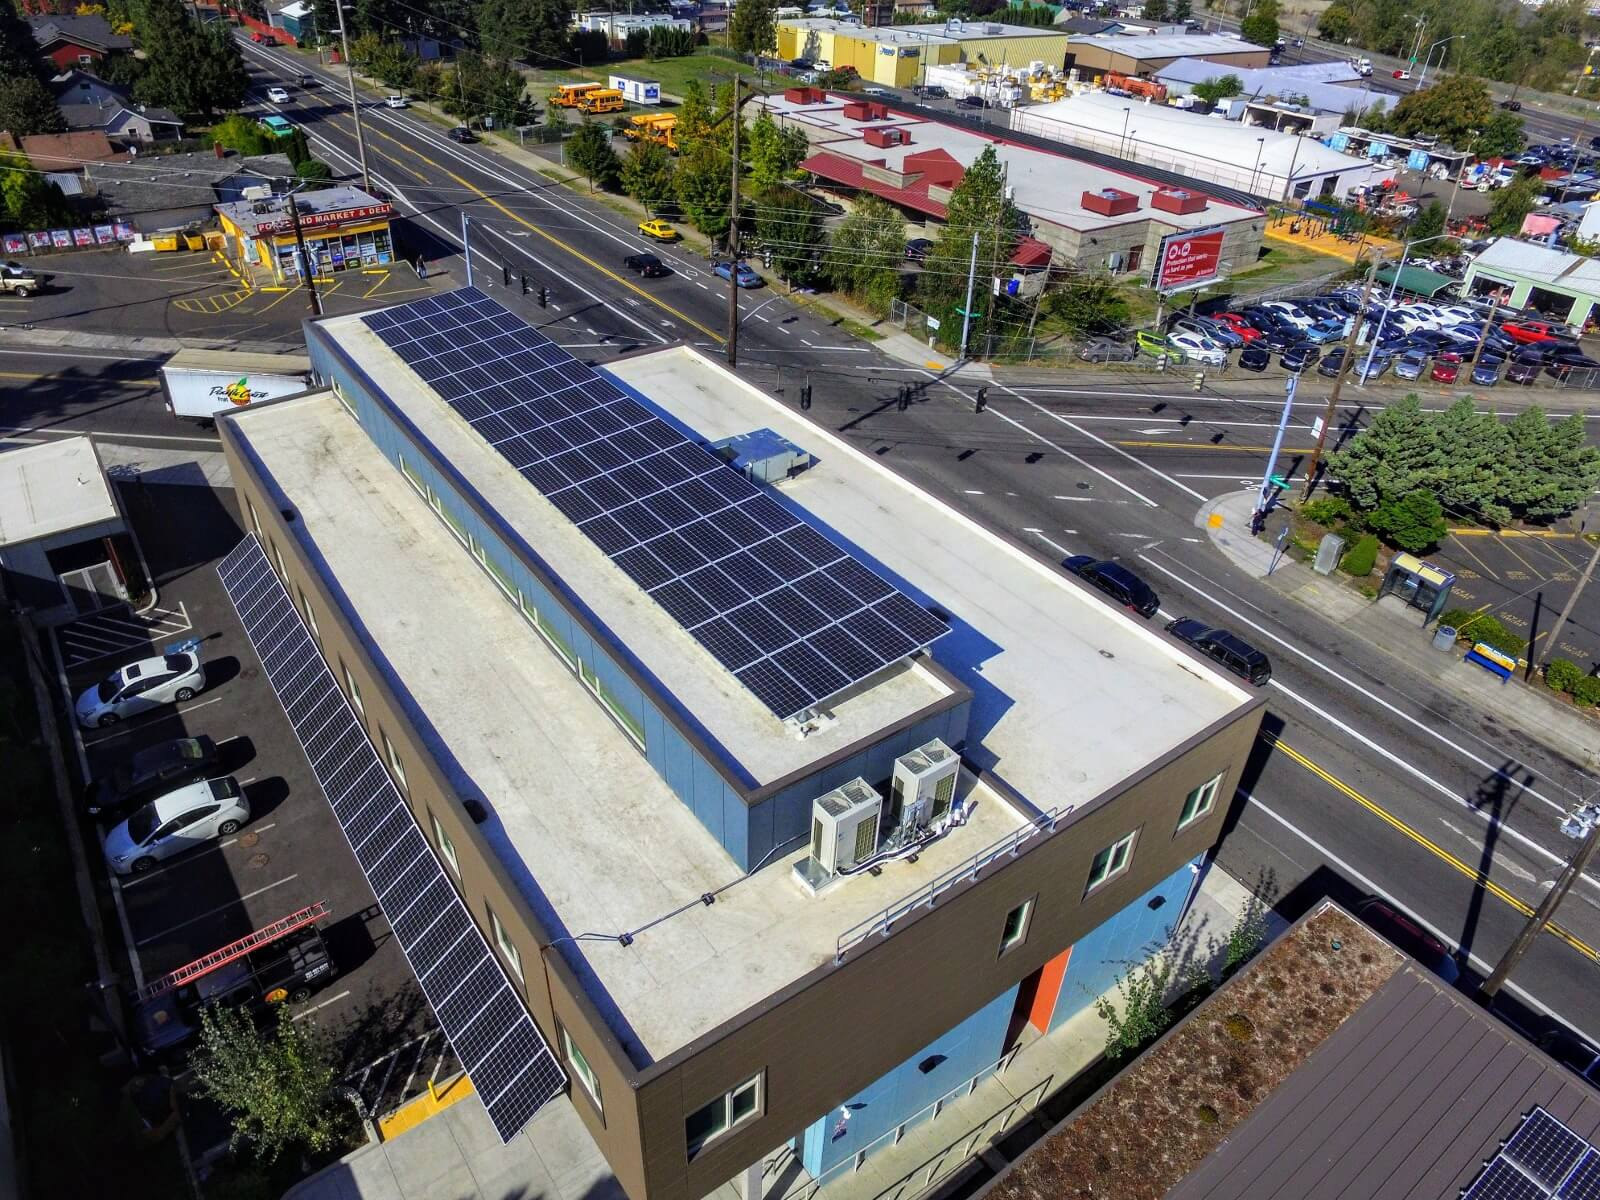 hacienda cdc solar roof panels.jpeg